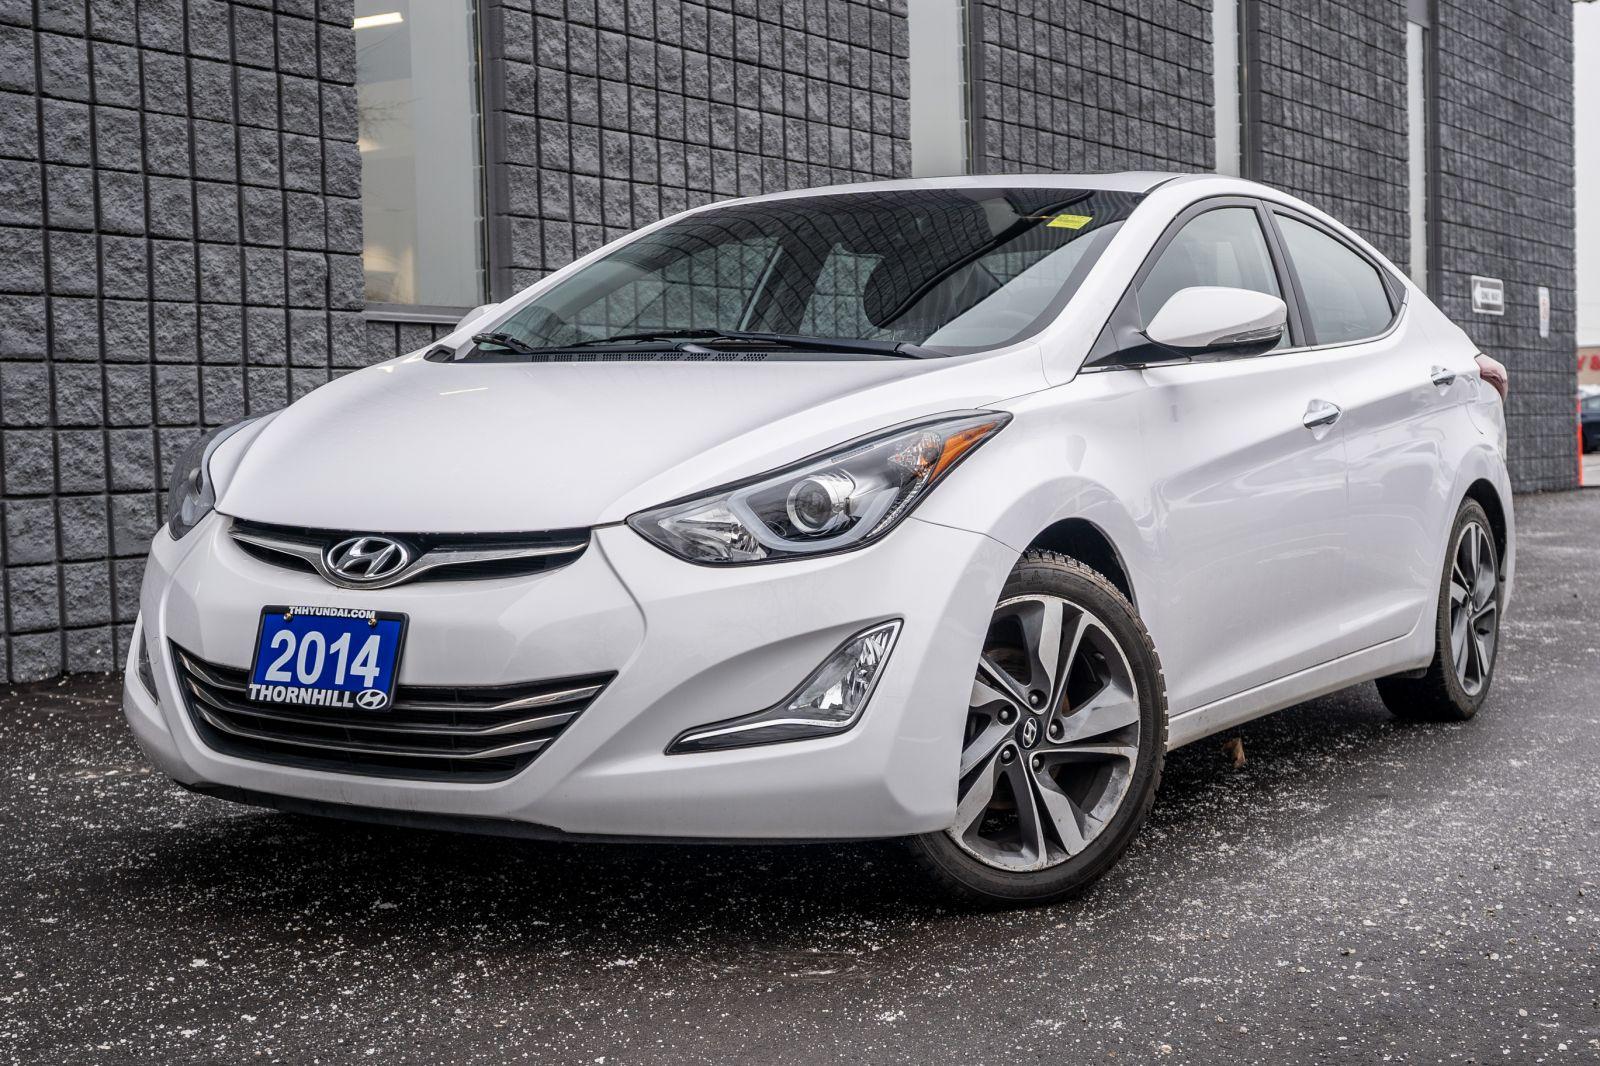 2014 Hyundai Elantra Image